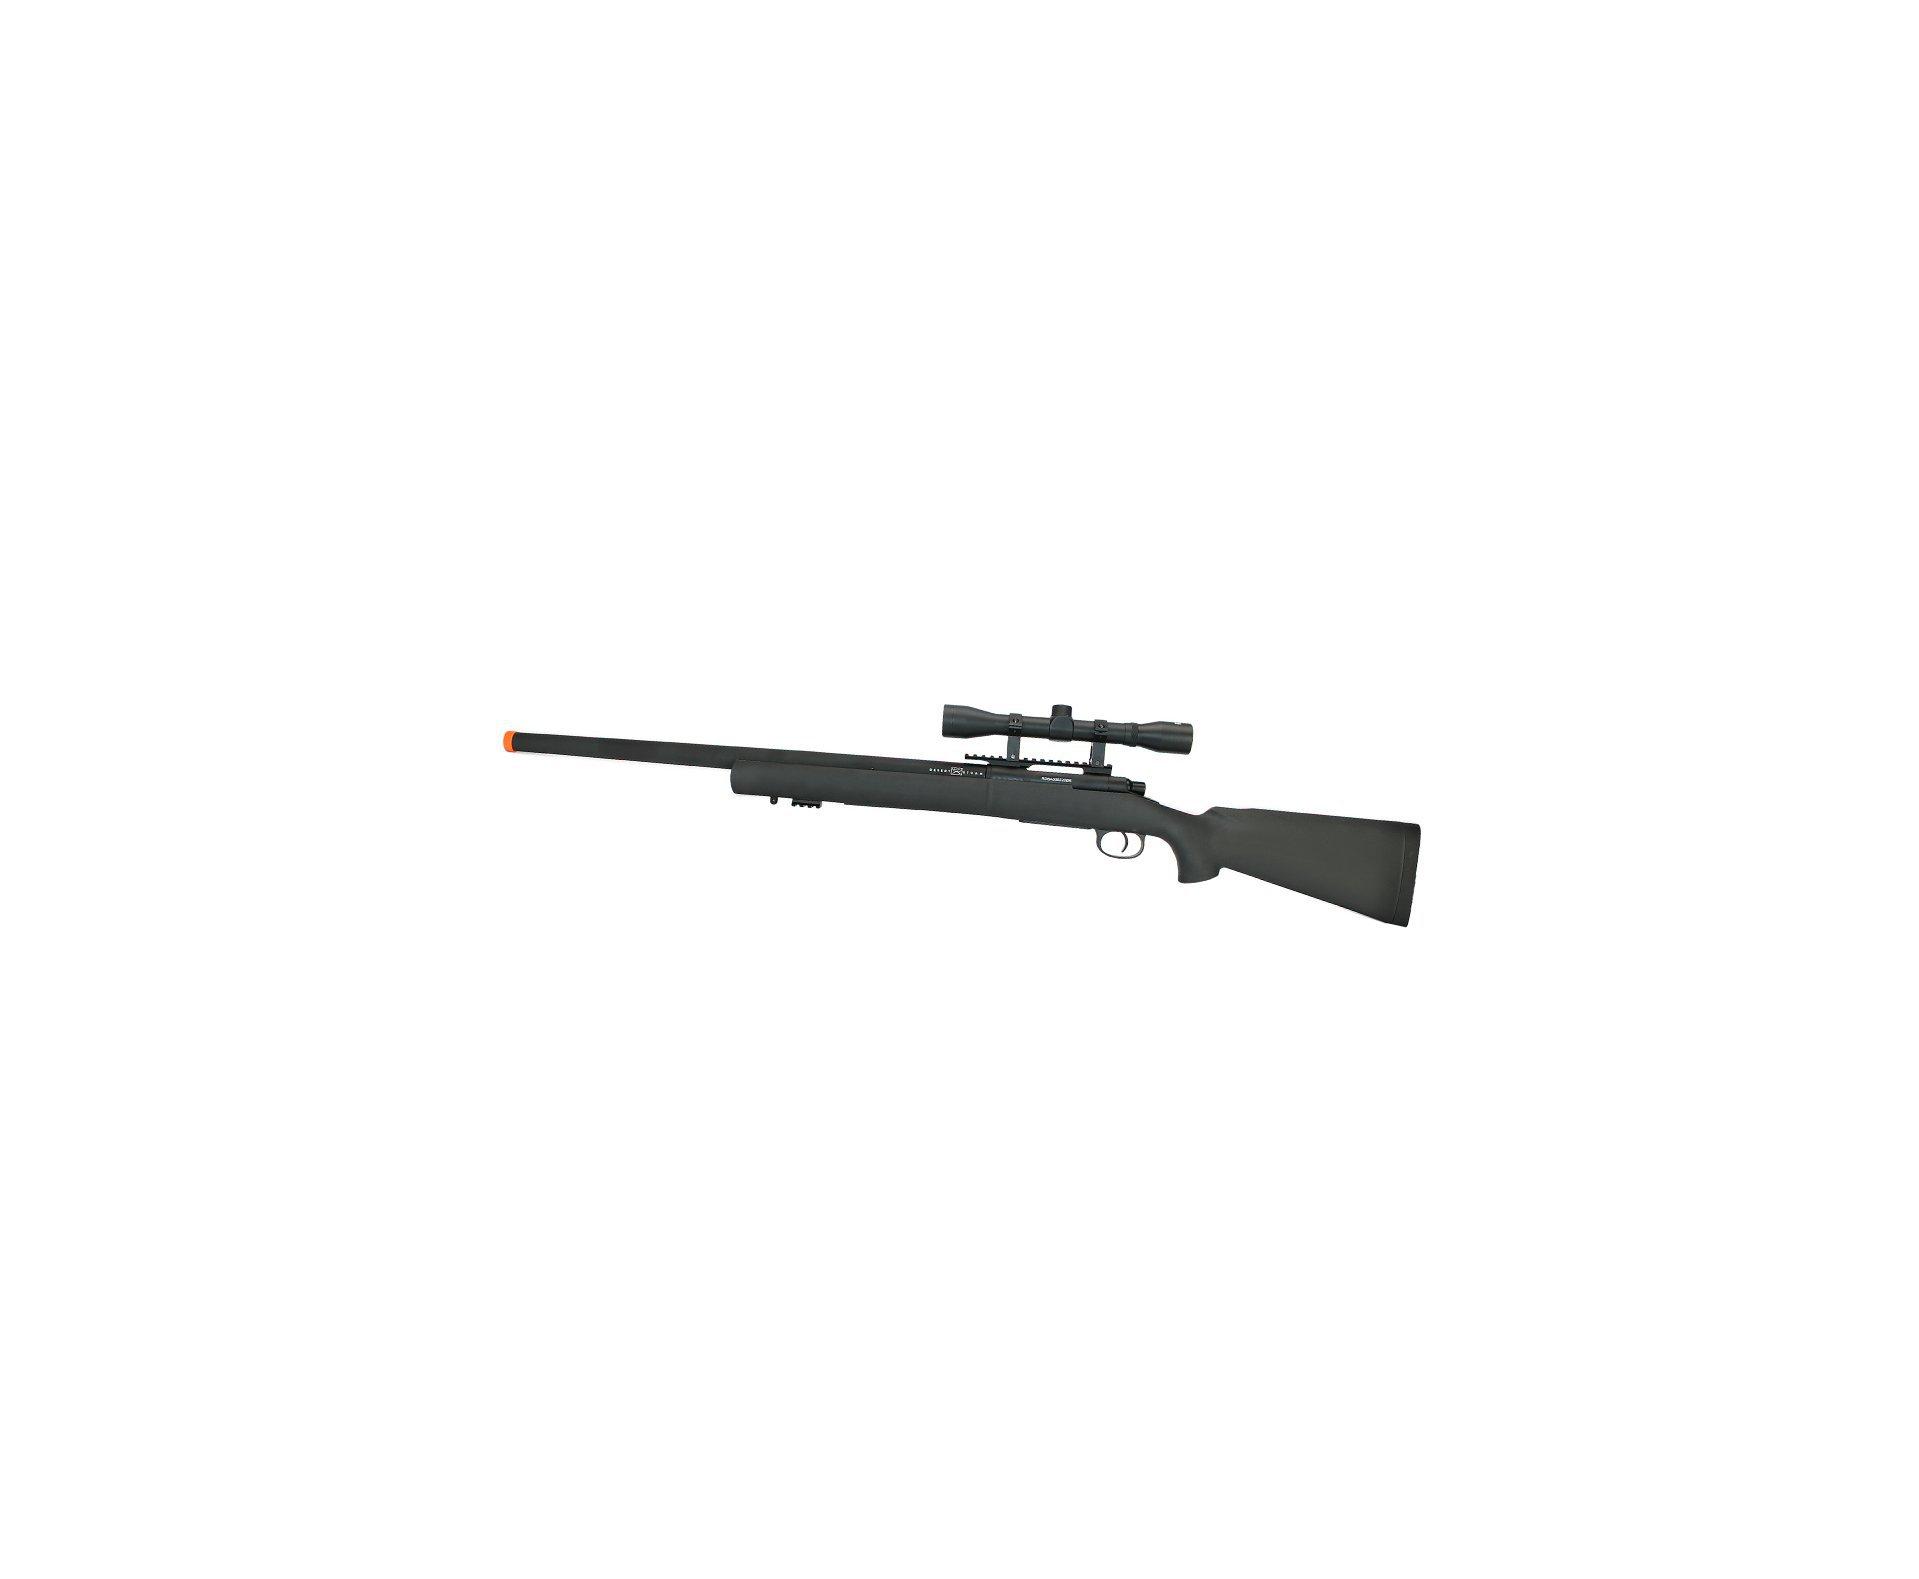 Rifle De Airsoft Sniper M24 Storm Full Metal Vsr10 Spring 6mm - Rossi + Luneta 4x32 + Bbs Raptor Sniper 0,30g 2000uni